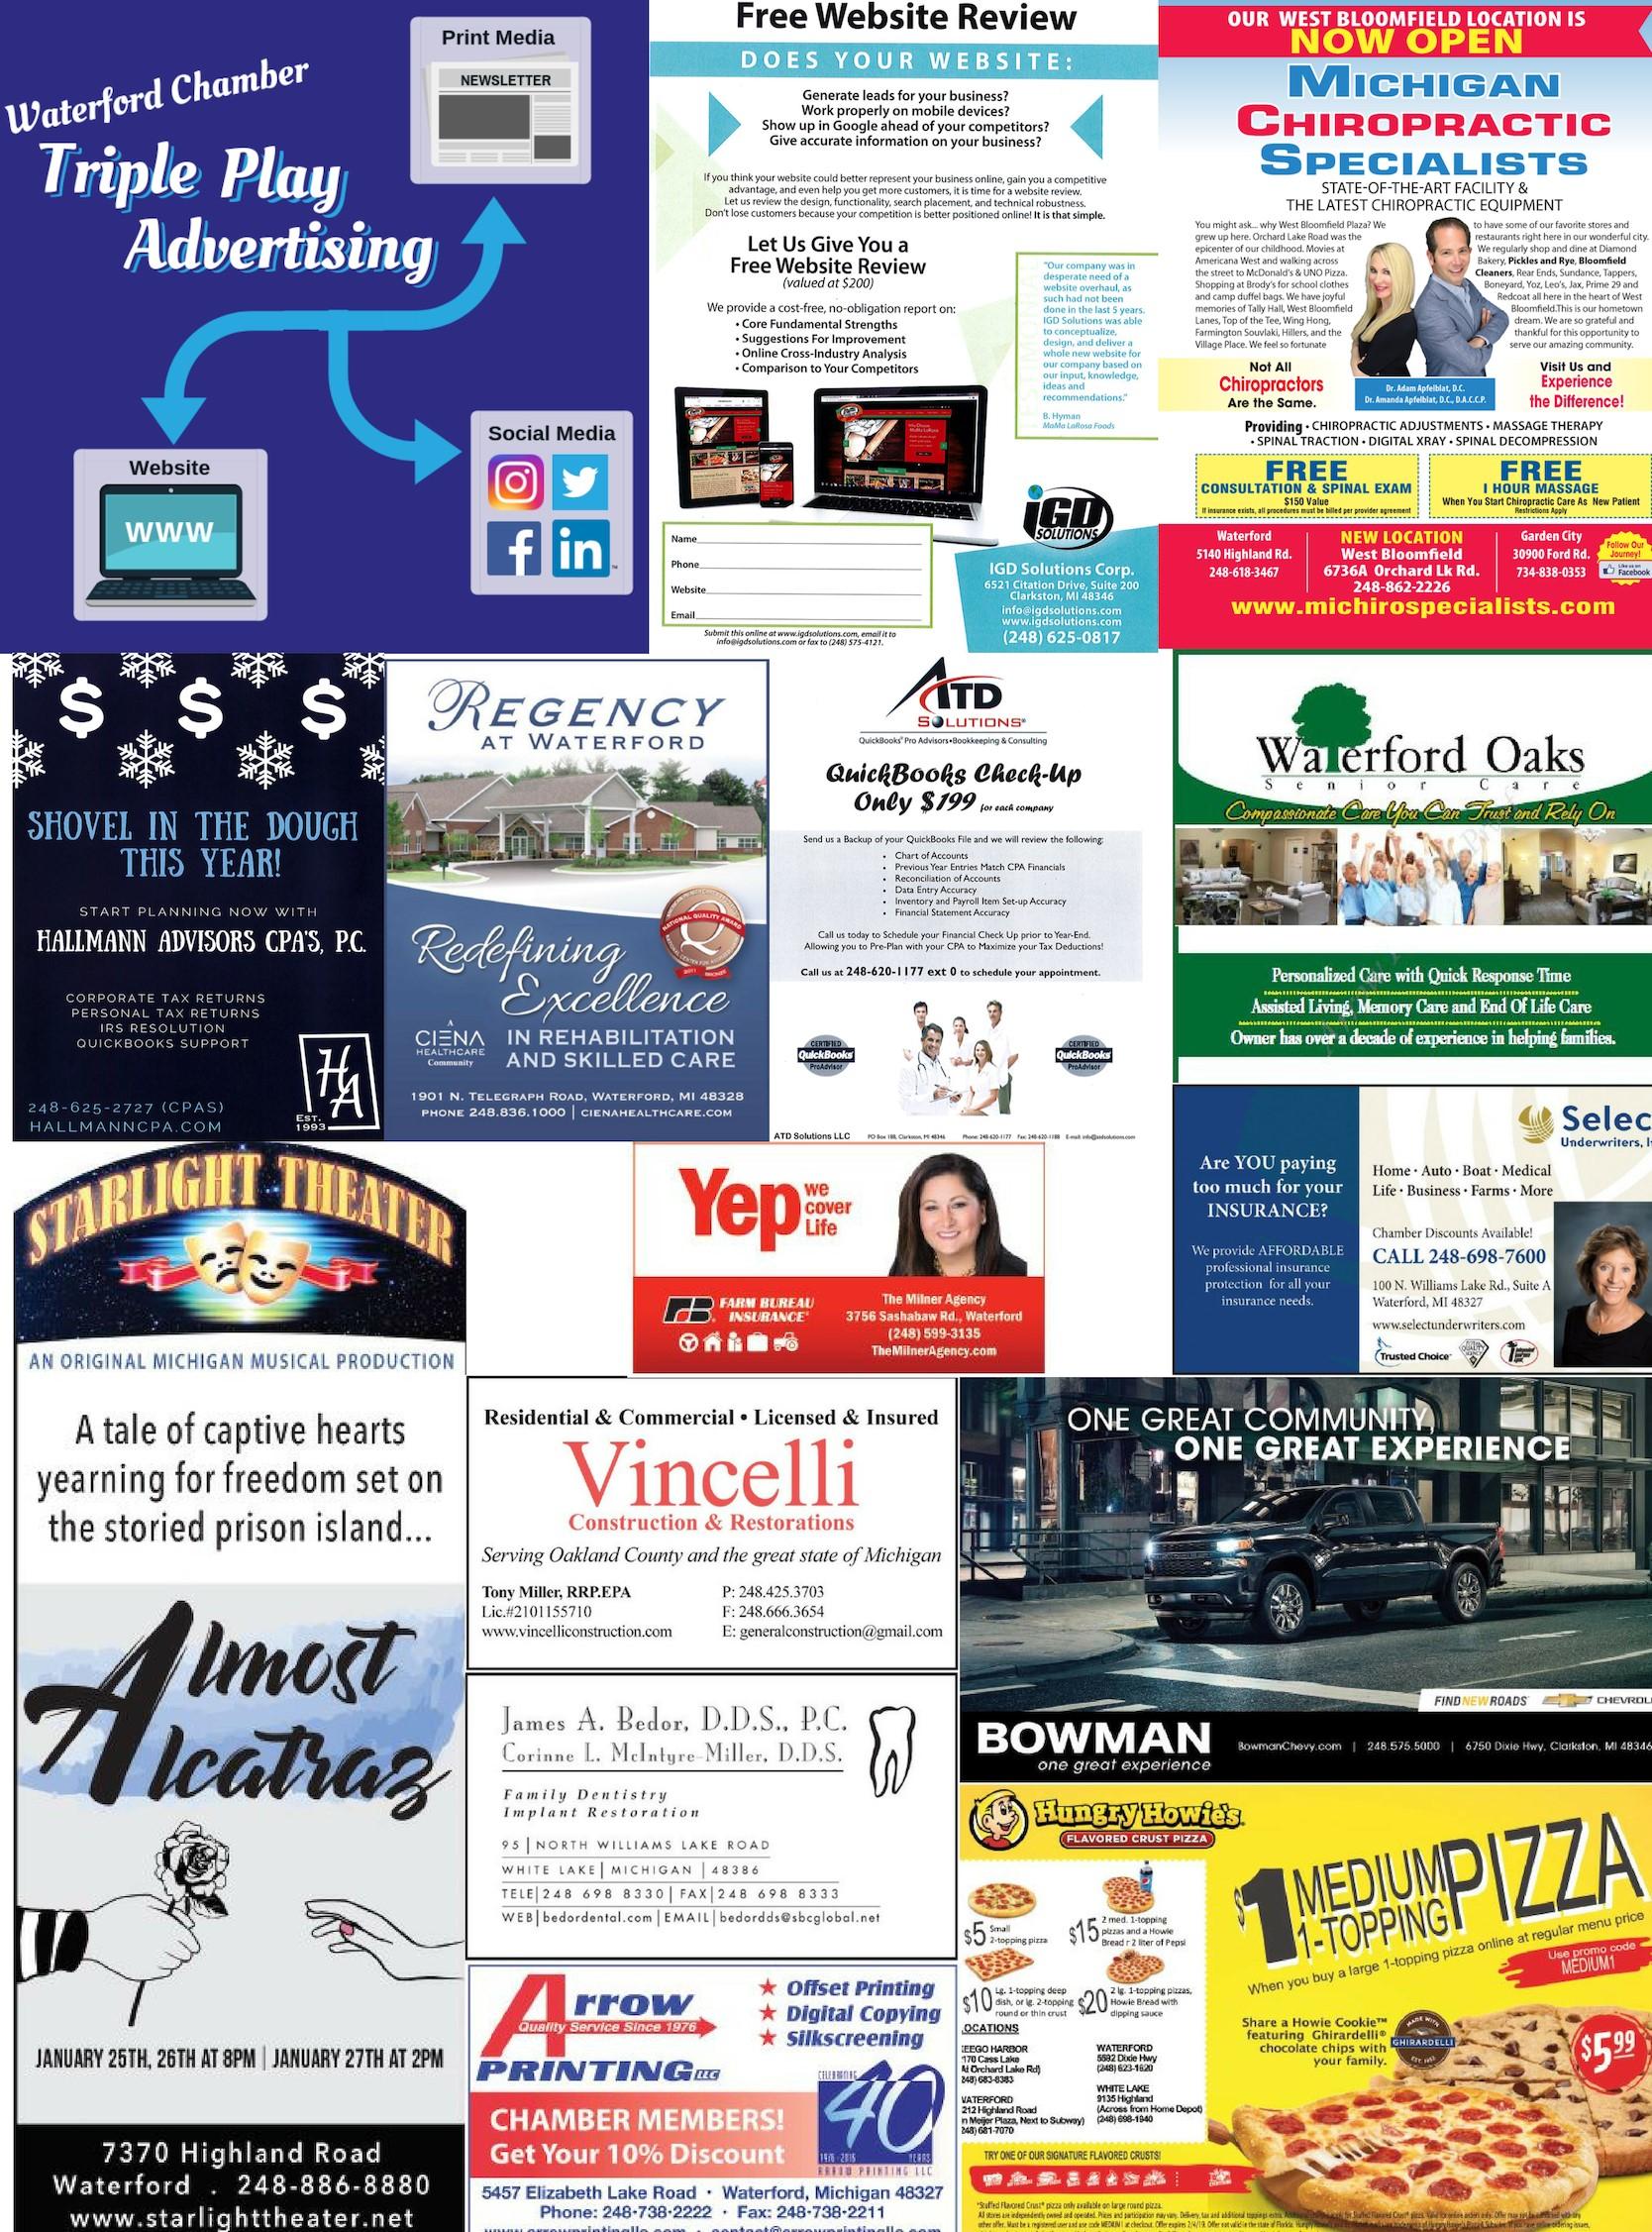 Triple Play Advertising Social Media